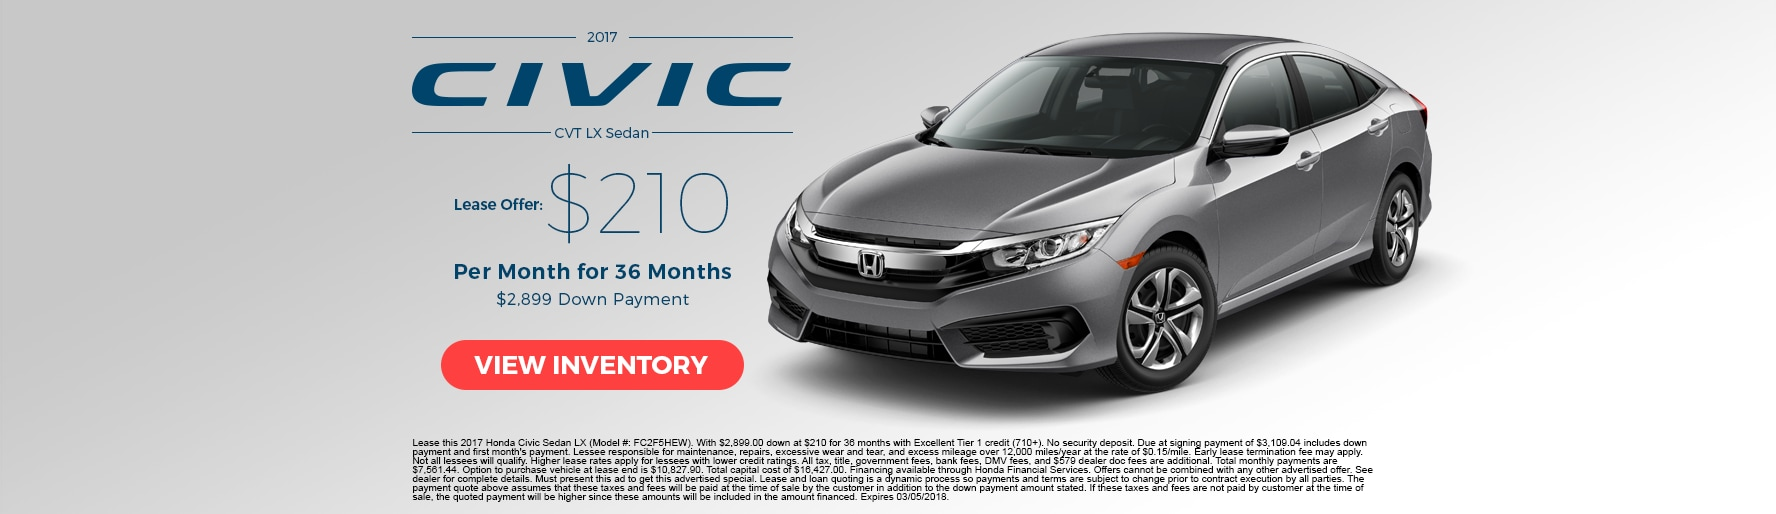 Used Car Dealerships In Raleigh Nc >> New Honda and Used Car Dealership| Serving Durham, Raleigh ...